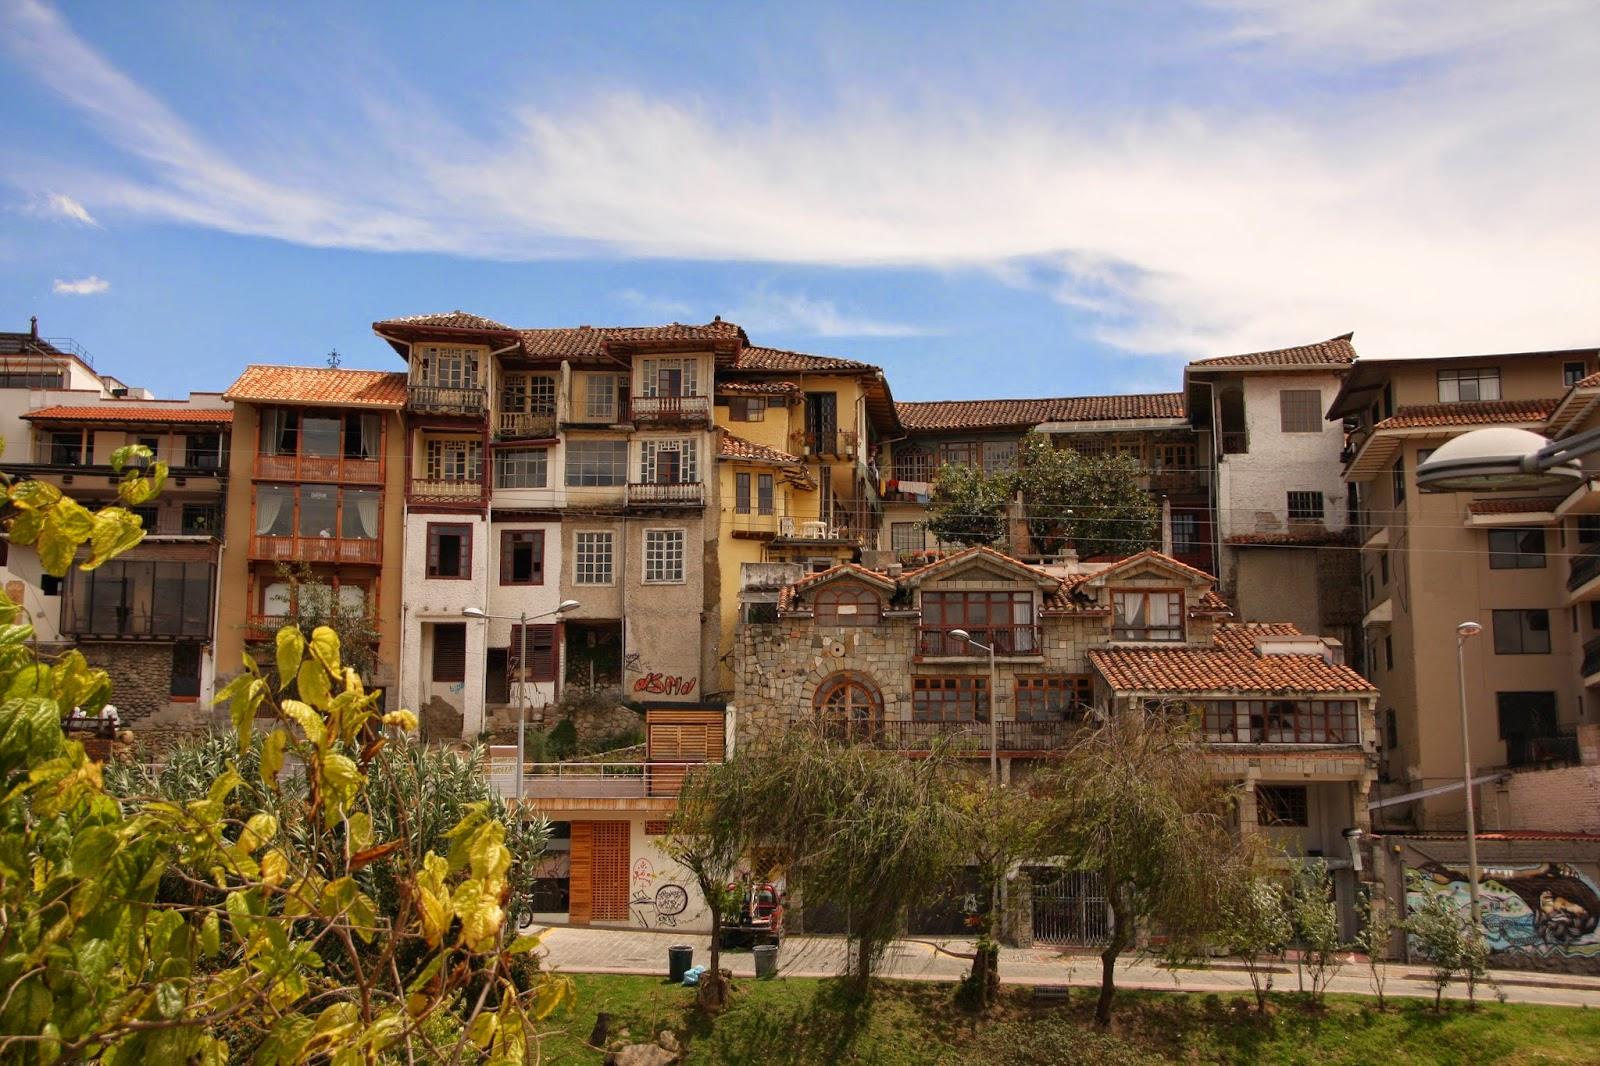 Viajes baratos por ecuador cuenca d a 1 for Apartamentos baratos en sevilla por dias